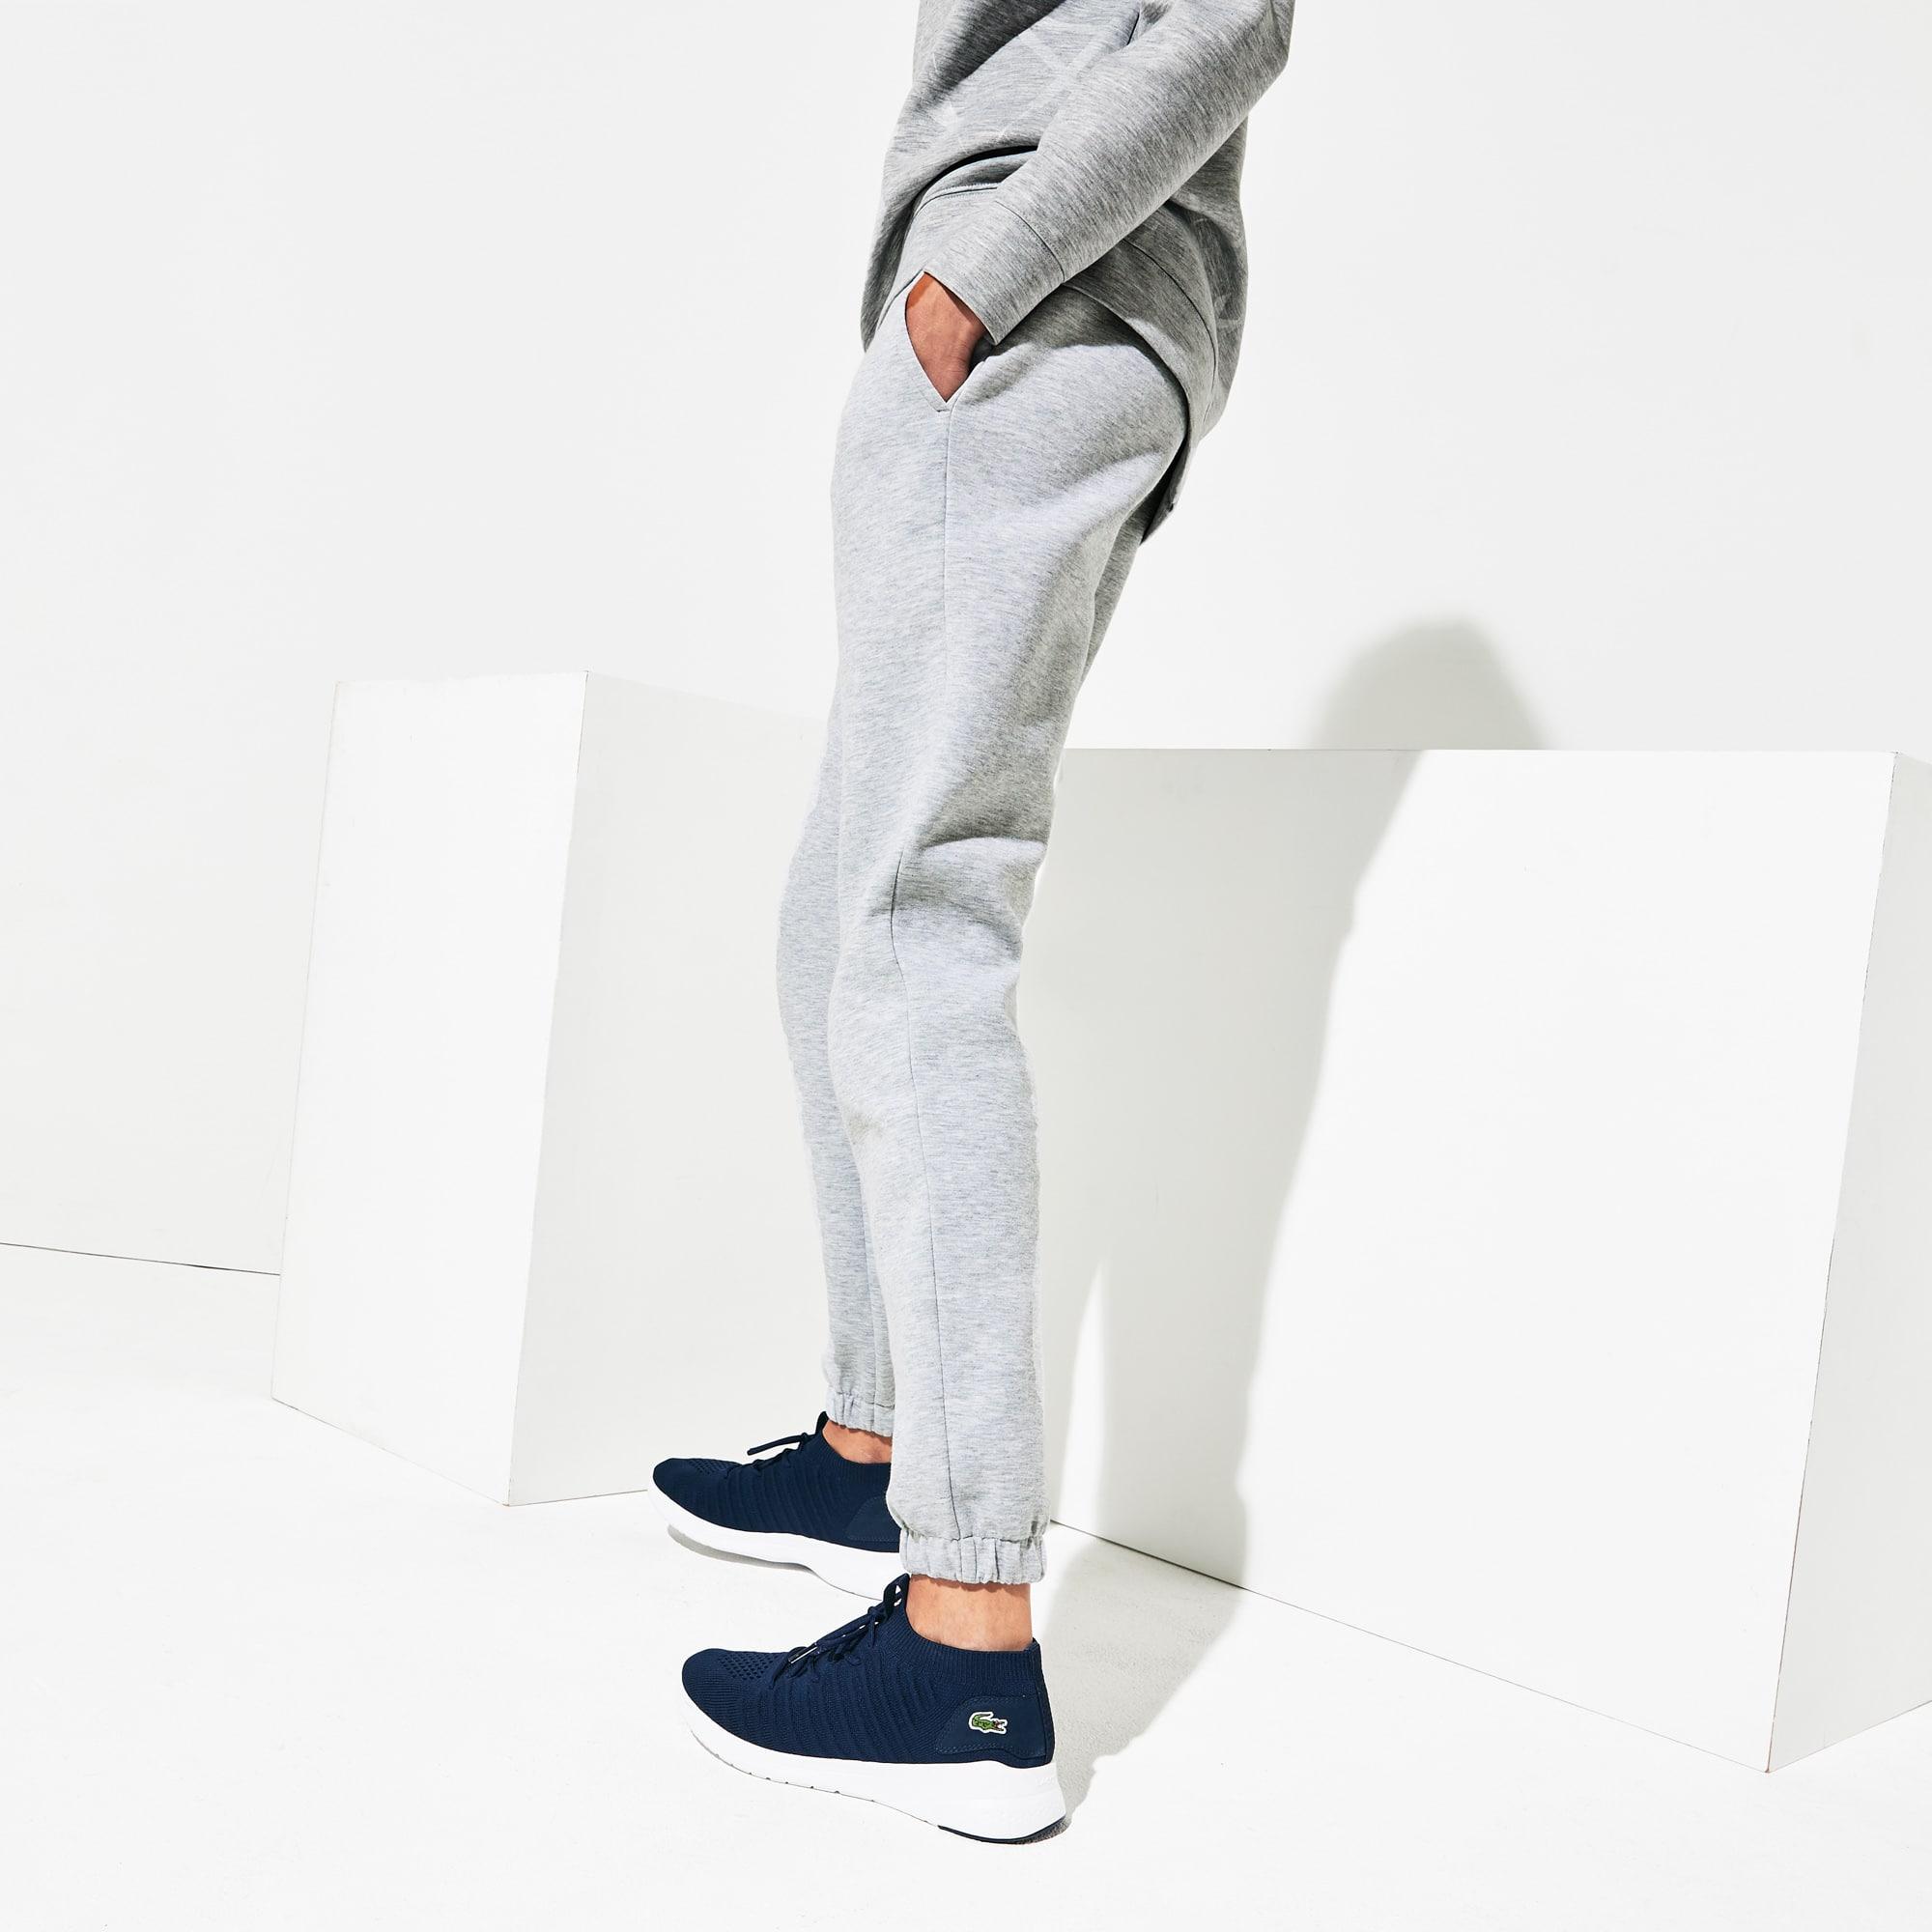 2cbaeb91df Women's Lacoste SPORT Signature Waistband Fleece Tennis Sweatpants ...